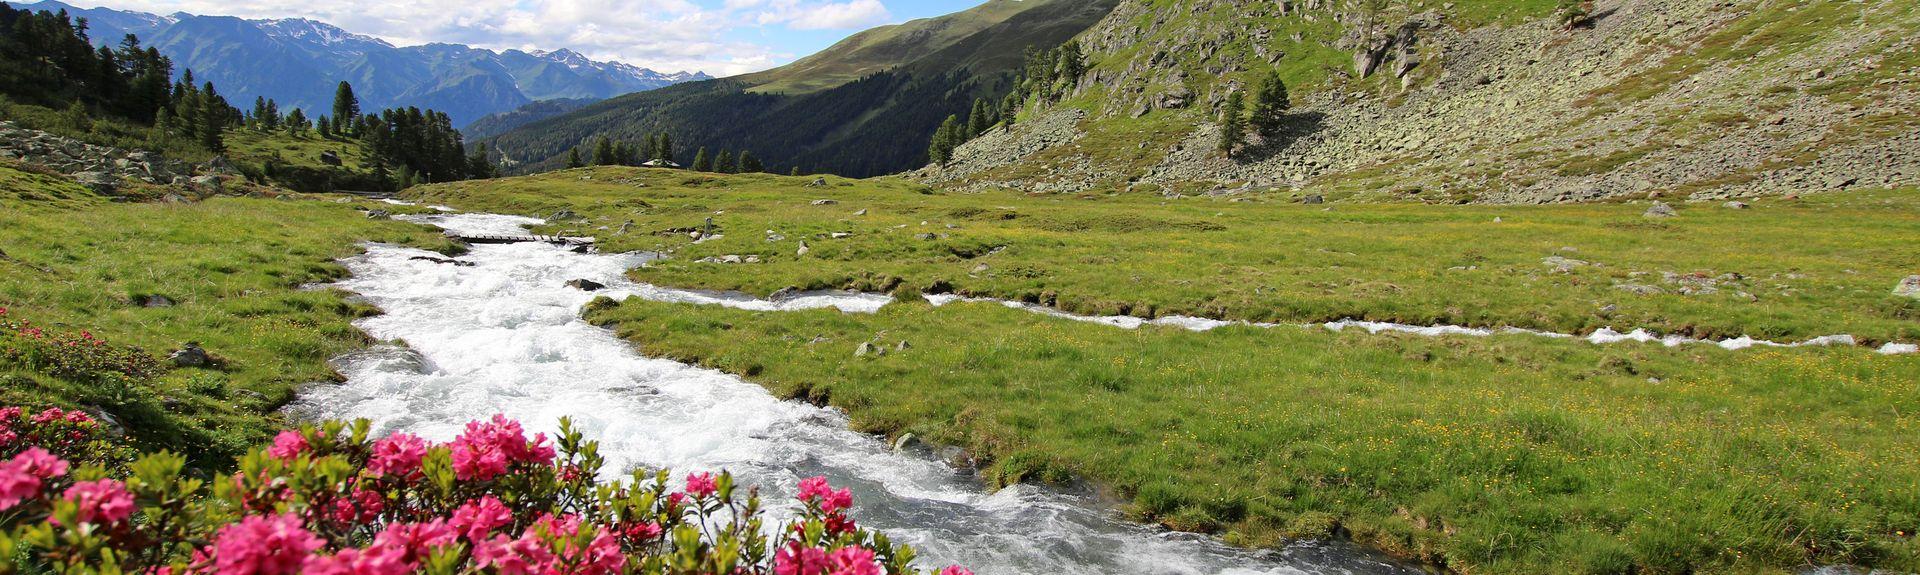 Pians, Tirol, Austria